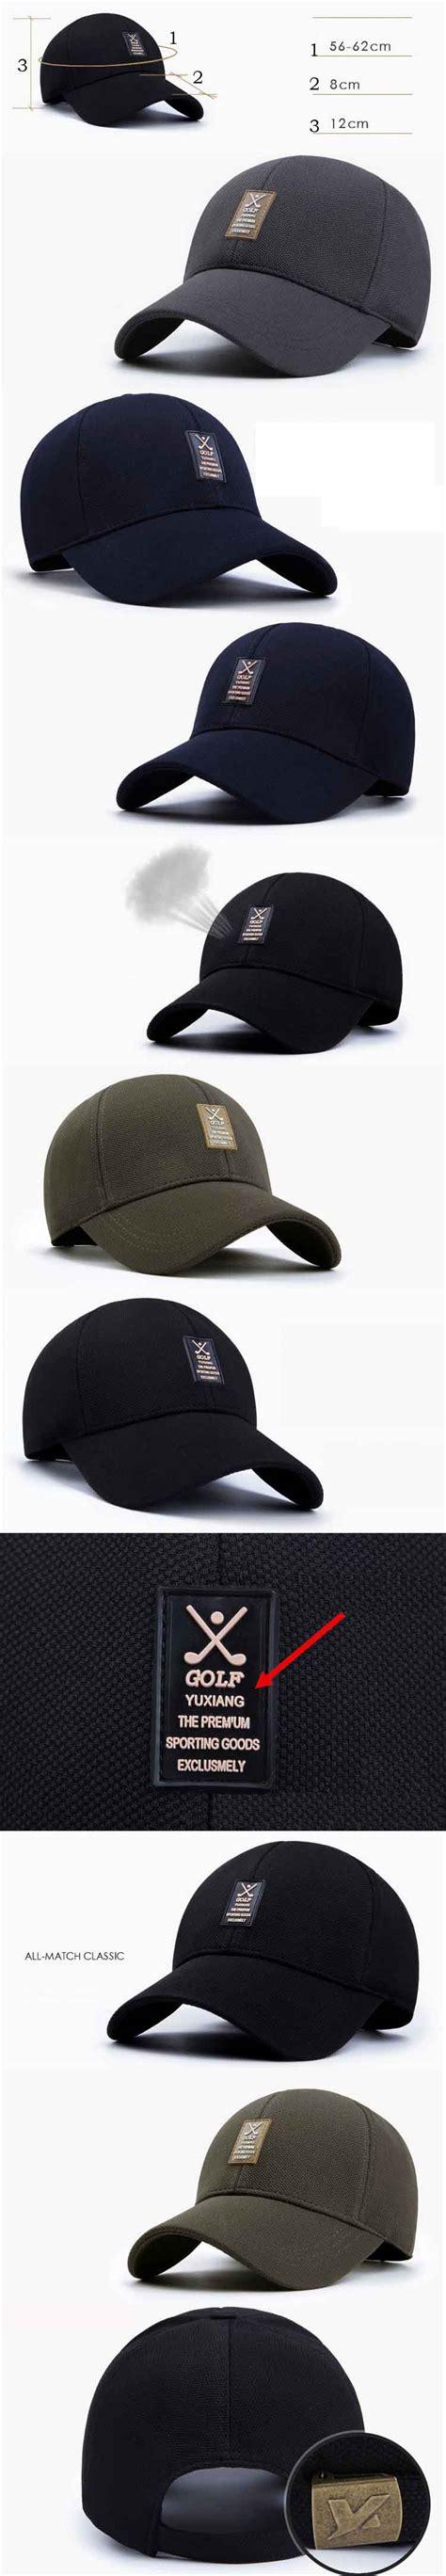 Topi Golf By Gonzales Sporty jual topi pria untuk golf